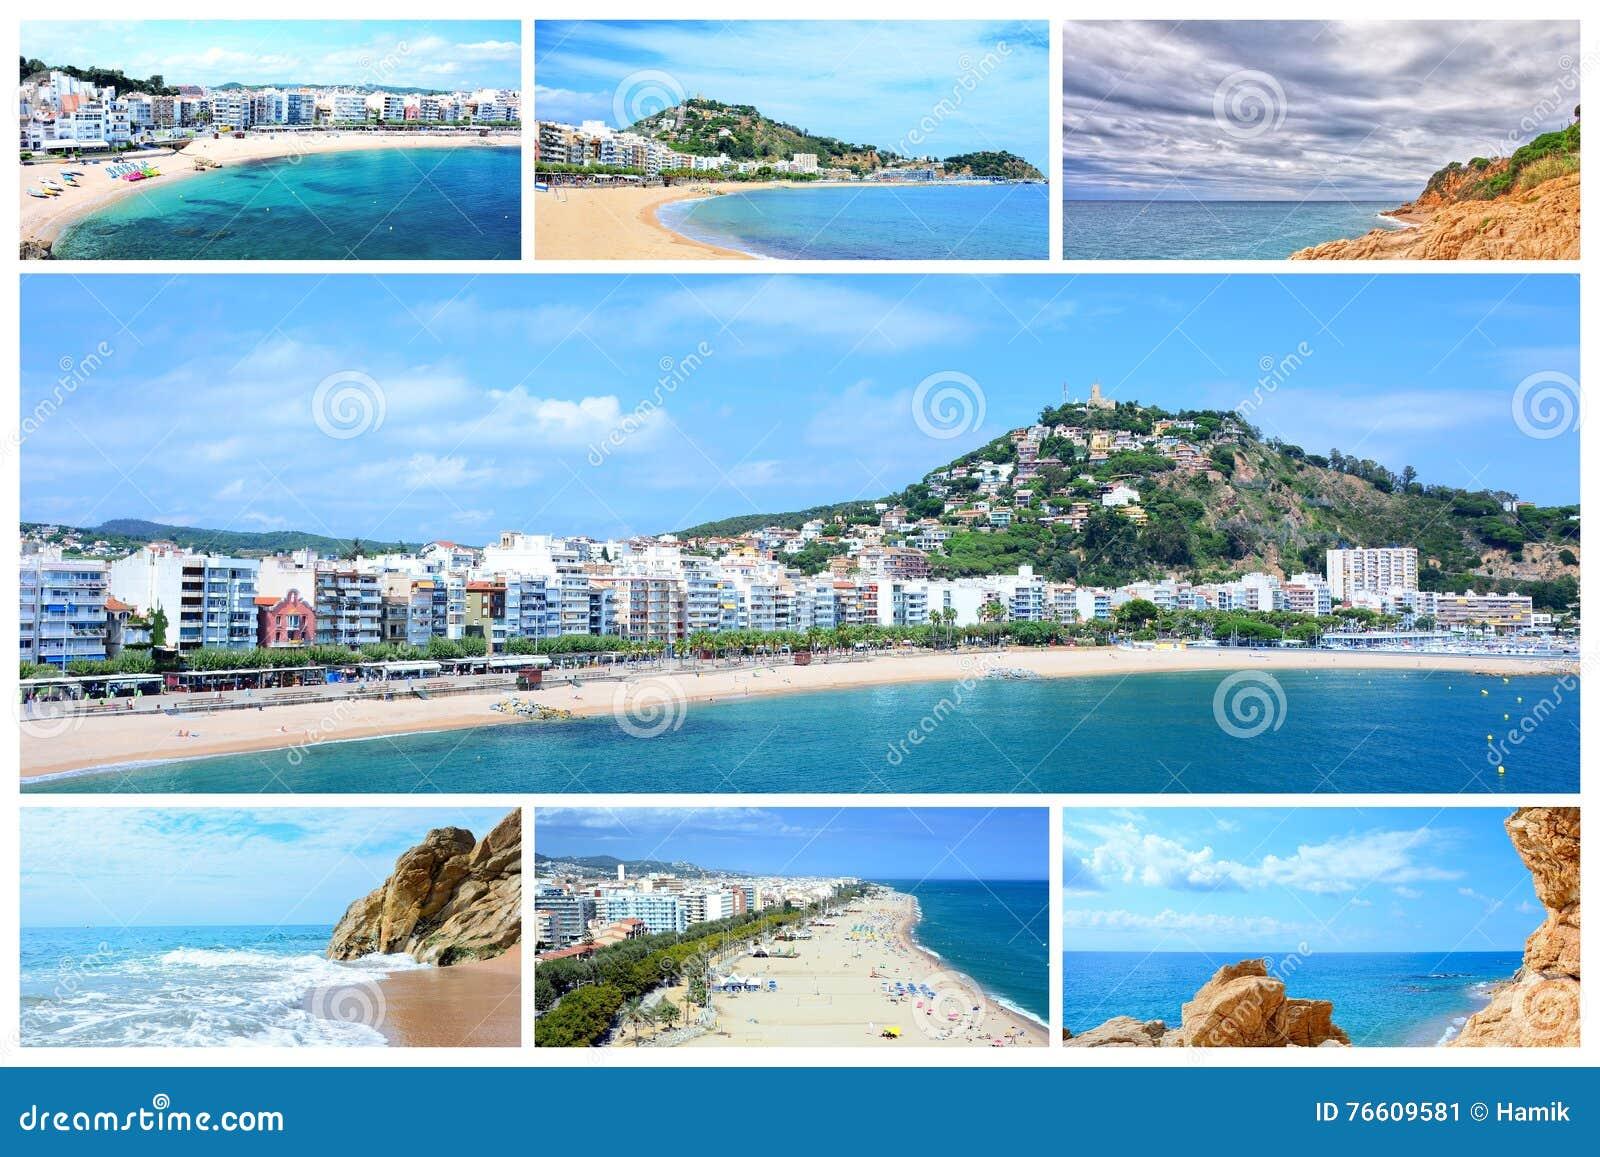 Carte Espagne Costa Brava Blanes.Collage De Photo De Costa Brava Image Stock Image Du